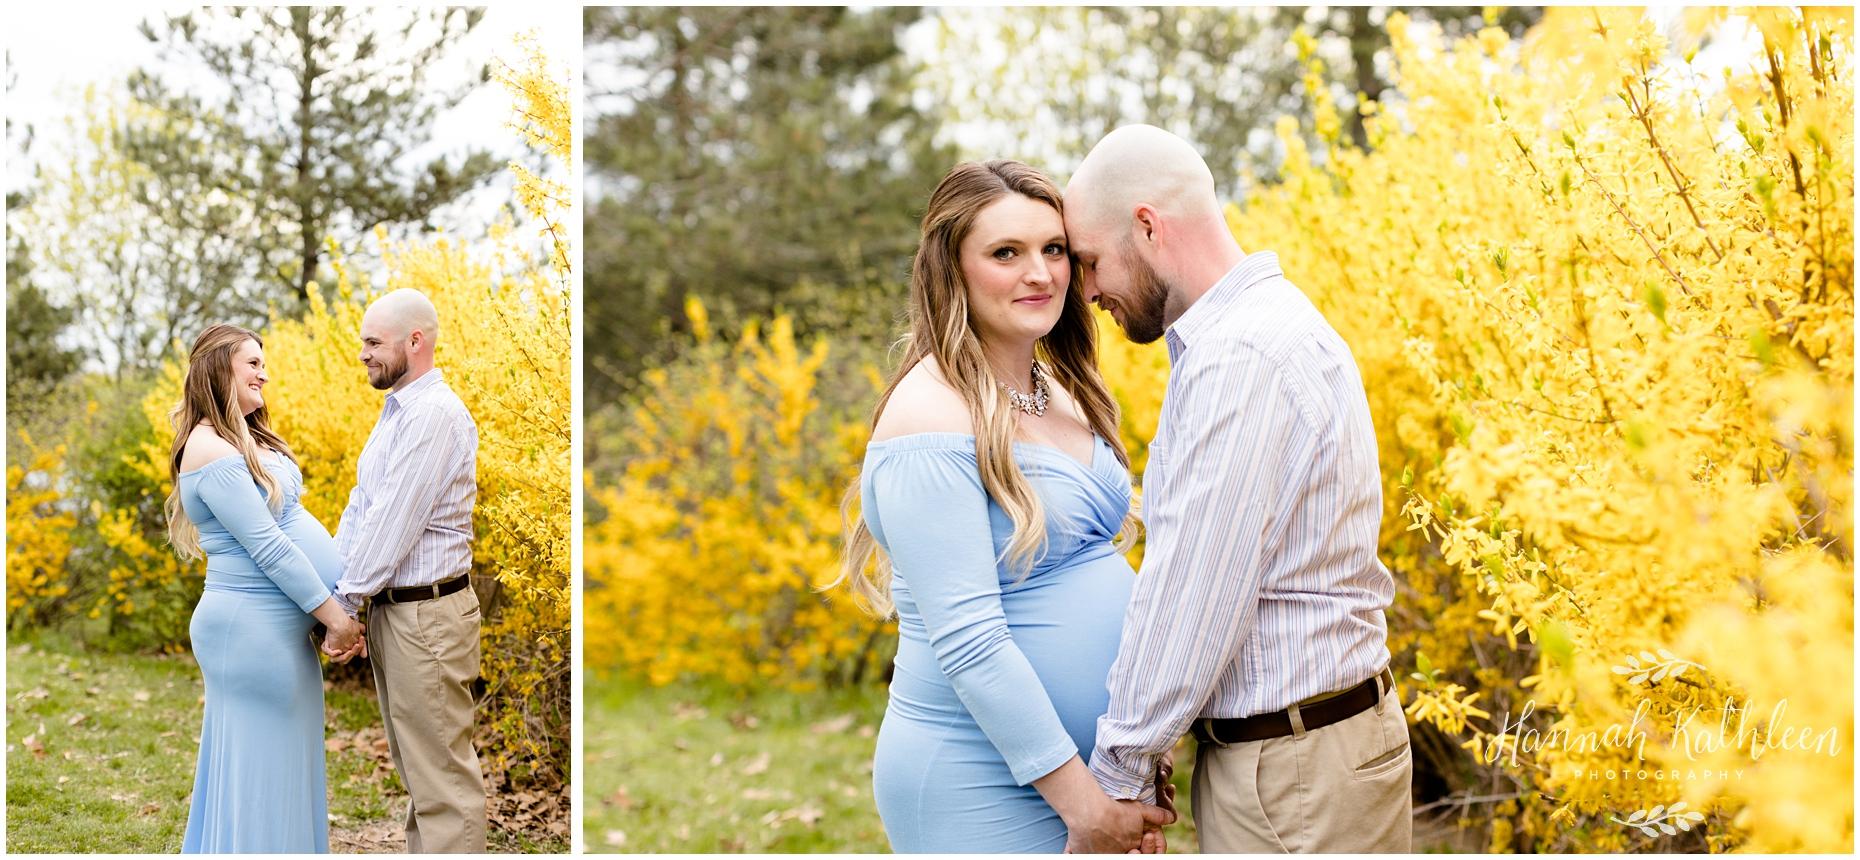 julie_ryan_maternity_photography_session_spring_buffalo_ny_delaware_park_hoyt_lake